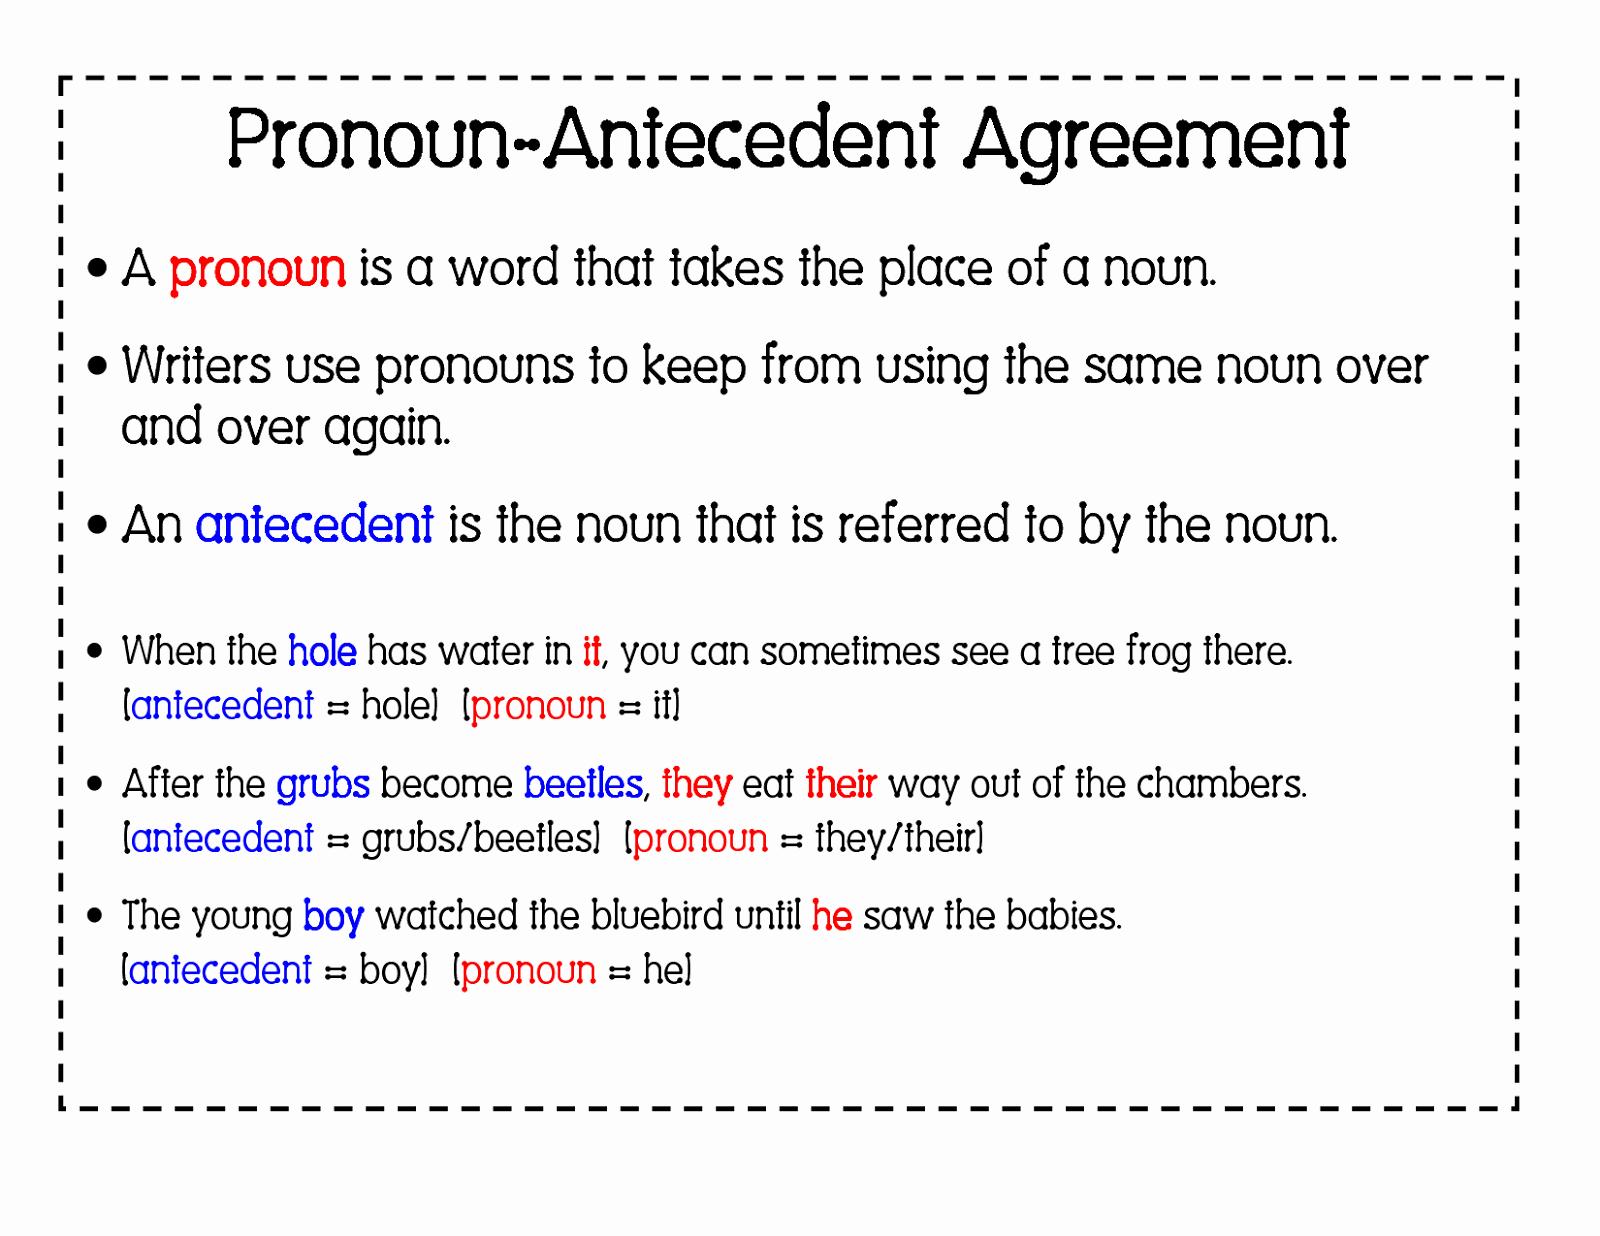 Pronoun Antecedent Agreement Worksheet Beautiful 6th Grade English with Mr T Pronoun Antecedent Agreement